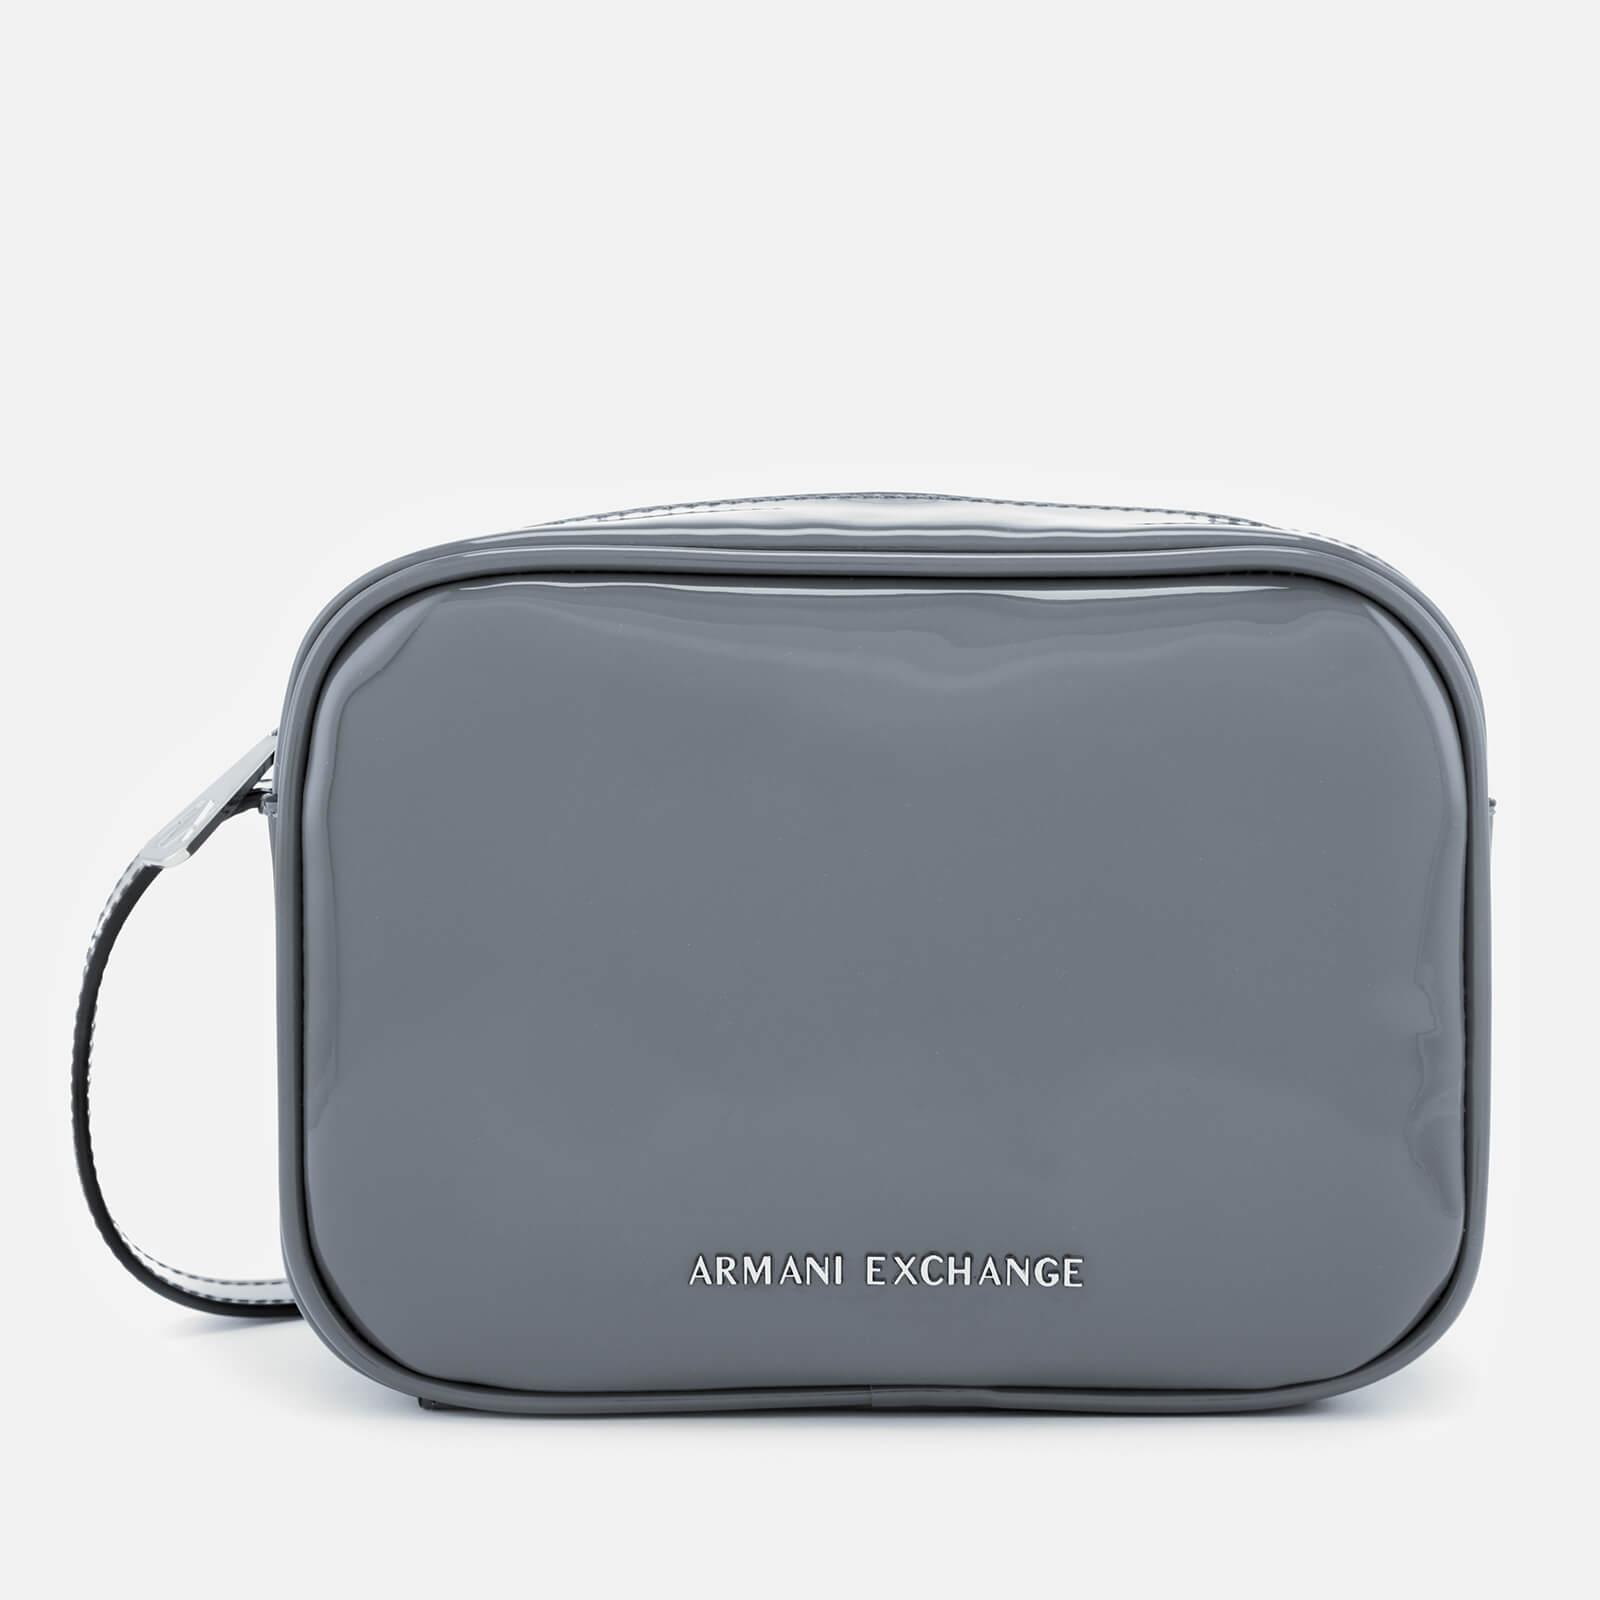 Armani Exchange - Multicolor Patent Logo Cross Body Bag - Lyst. View  fullscreen 7c74f252d0